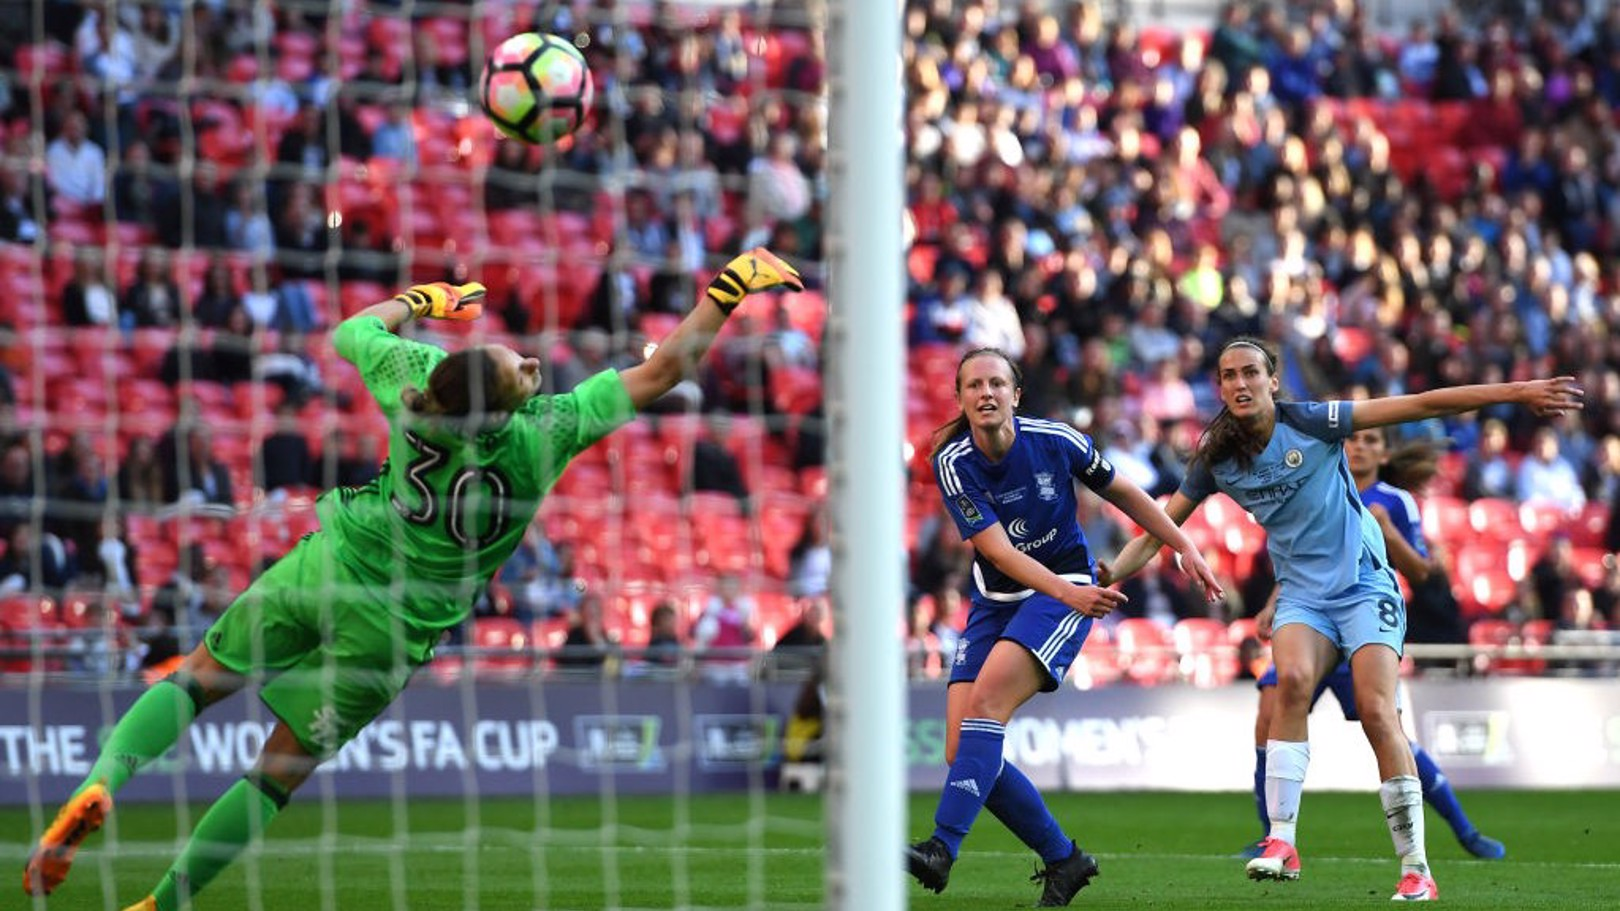 CUP WINNER: Jill Scott rifles home against Birmingham in the 2017 FA Cup final at Wembley.